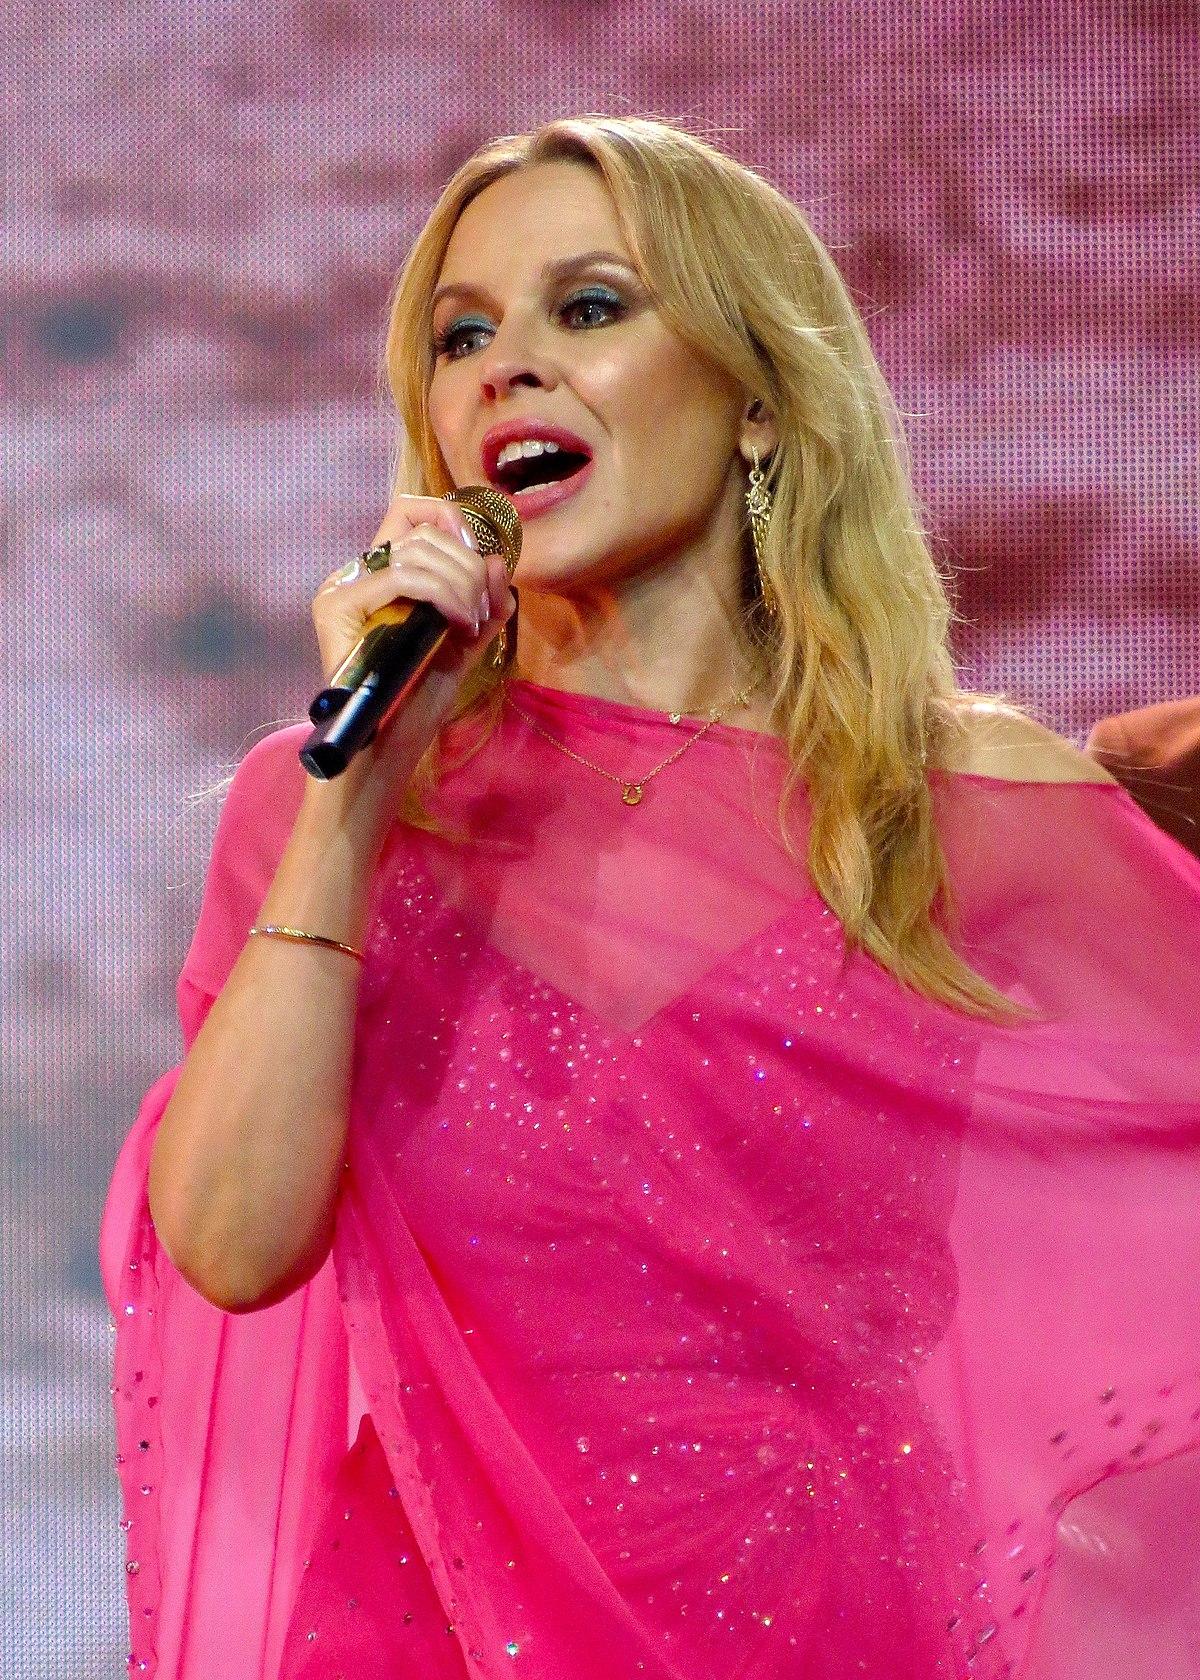 Kylie Minogue - Fine Wine Chords - Chordify